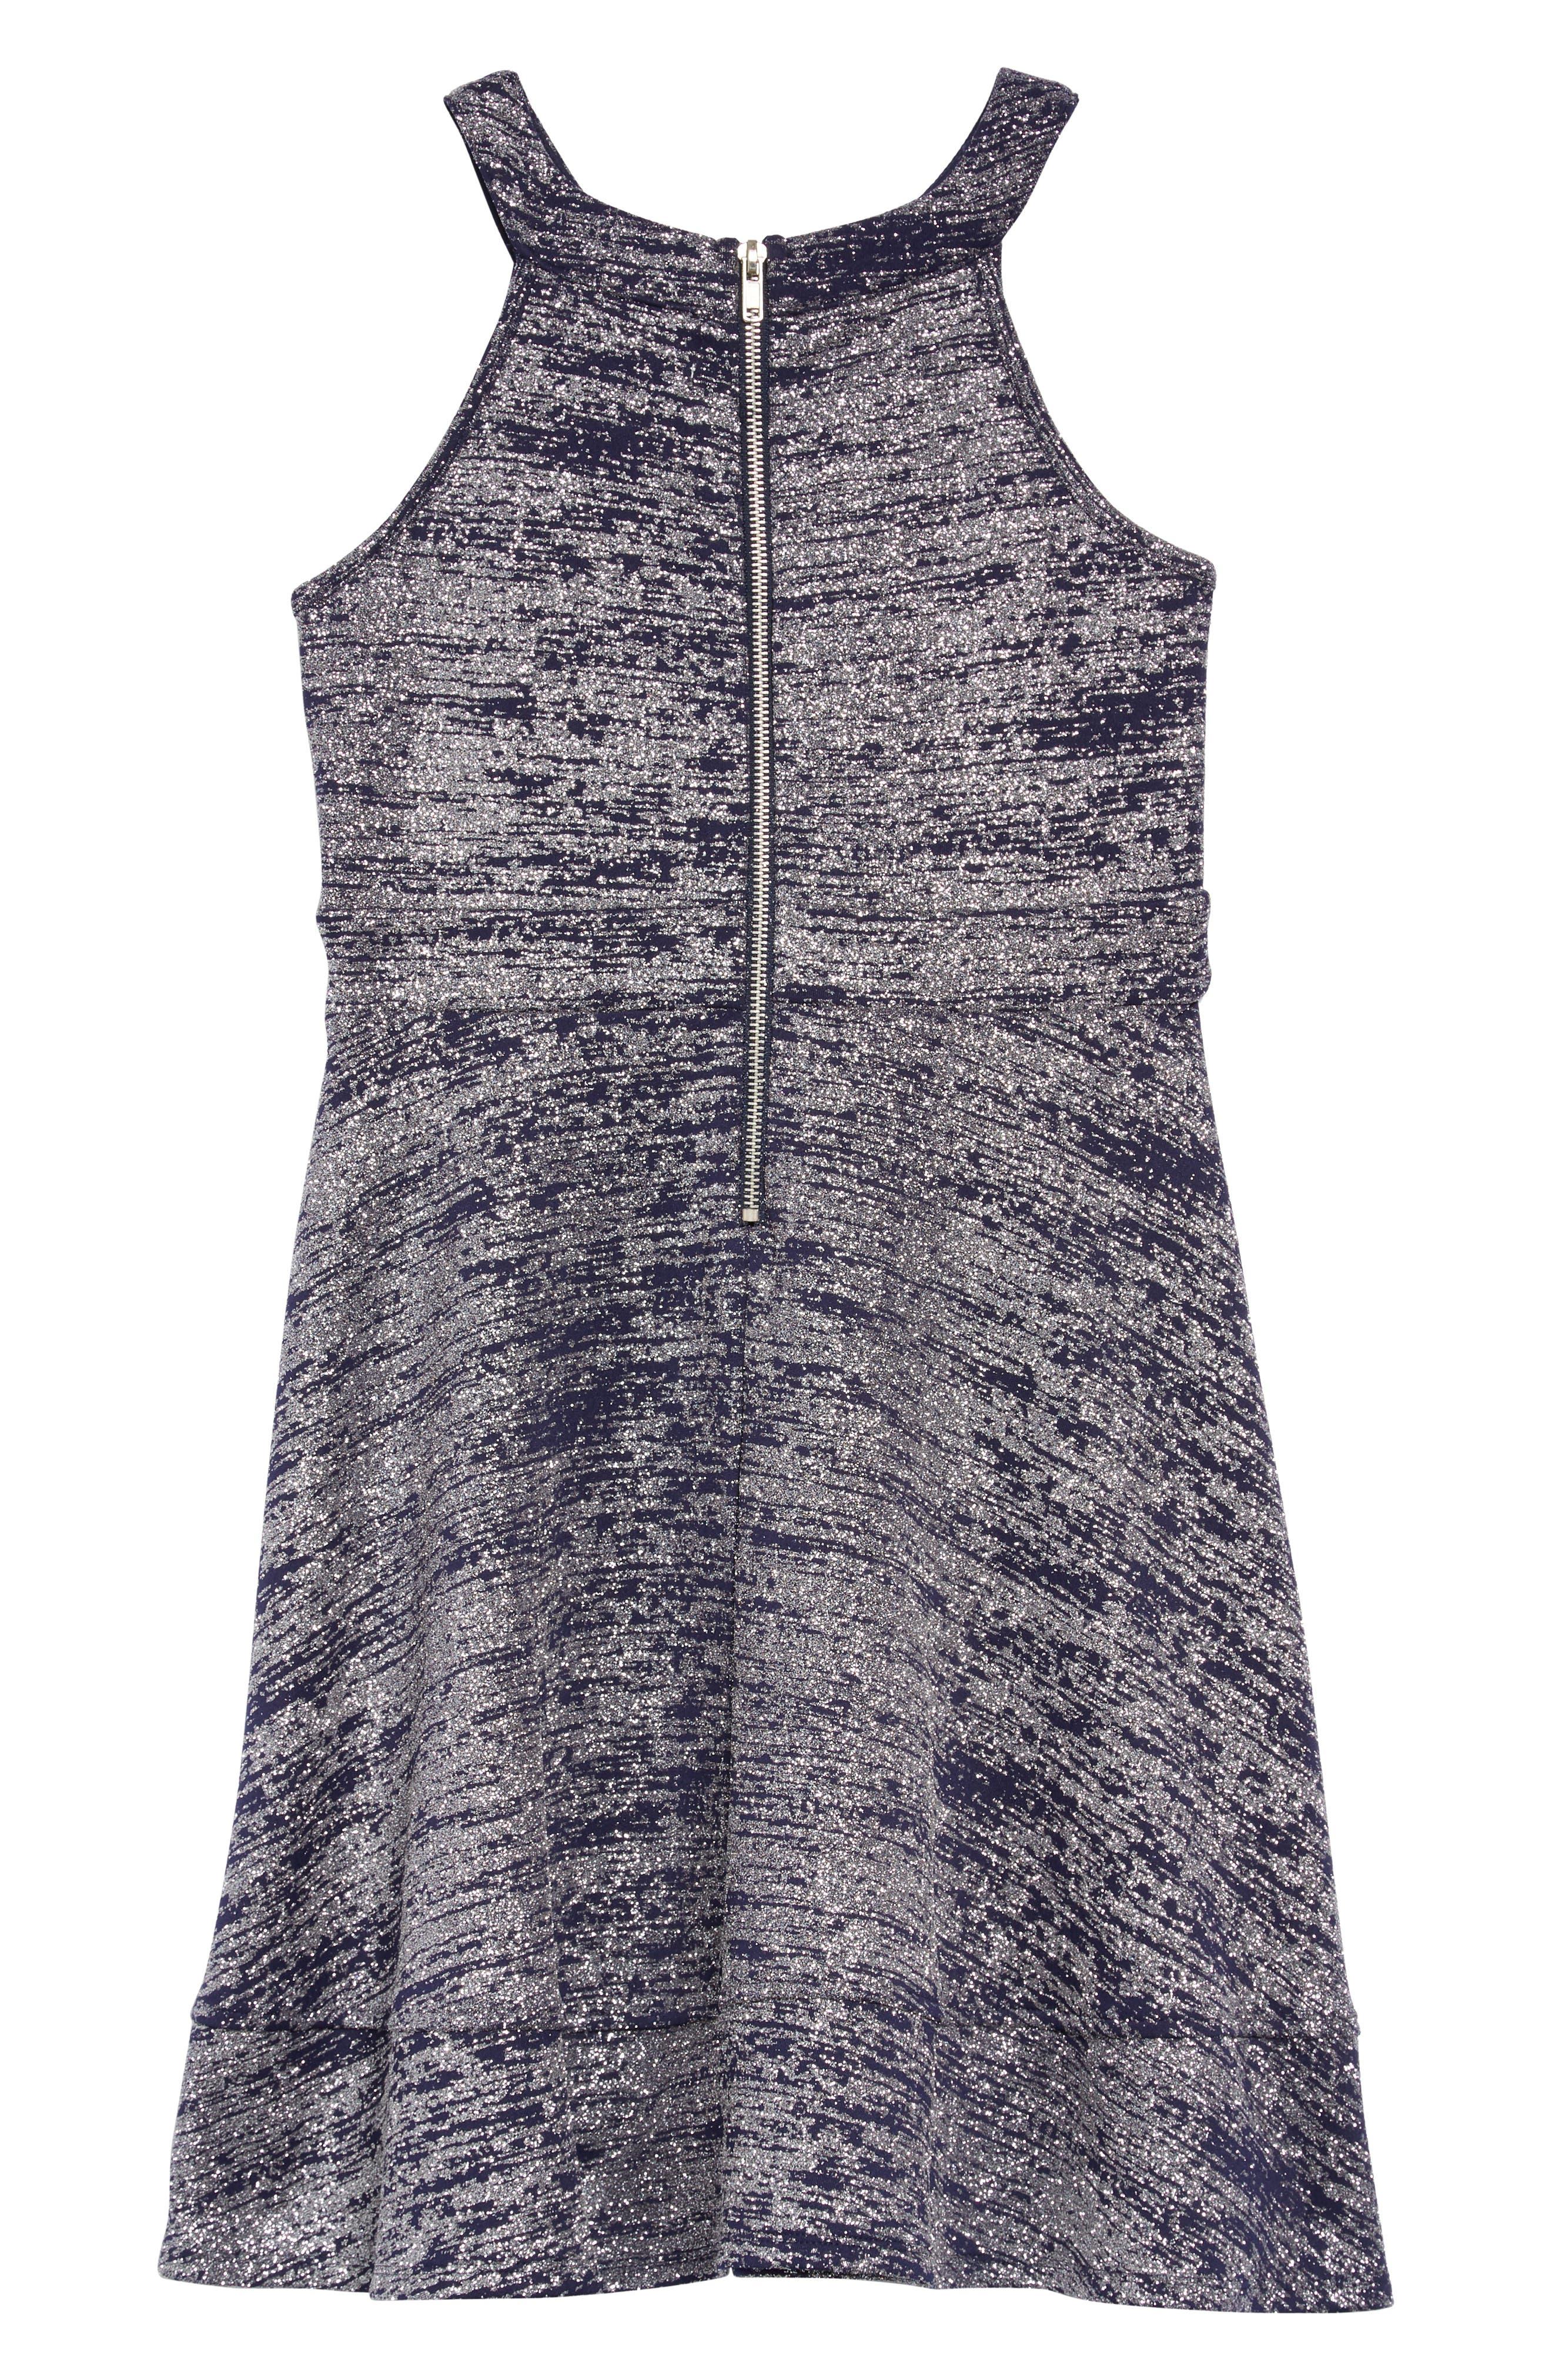 Glitter Illusion Neck Scuba Dress,                             Alternate thumbnail 2, color,                             NAVY/ SILVER